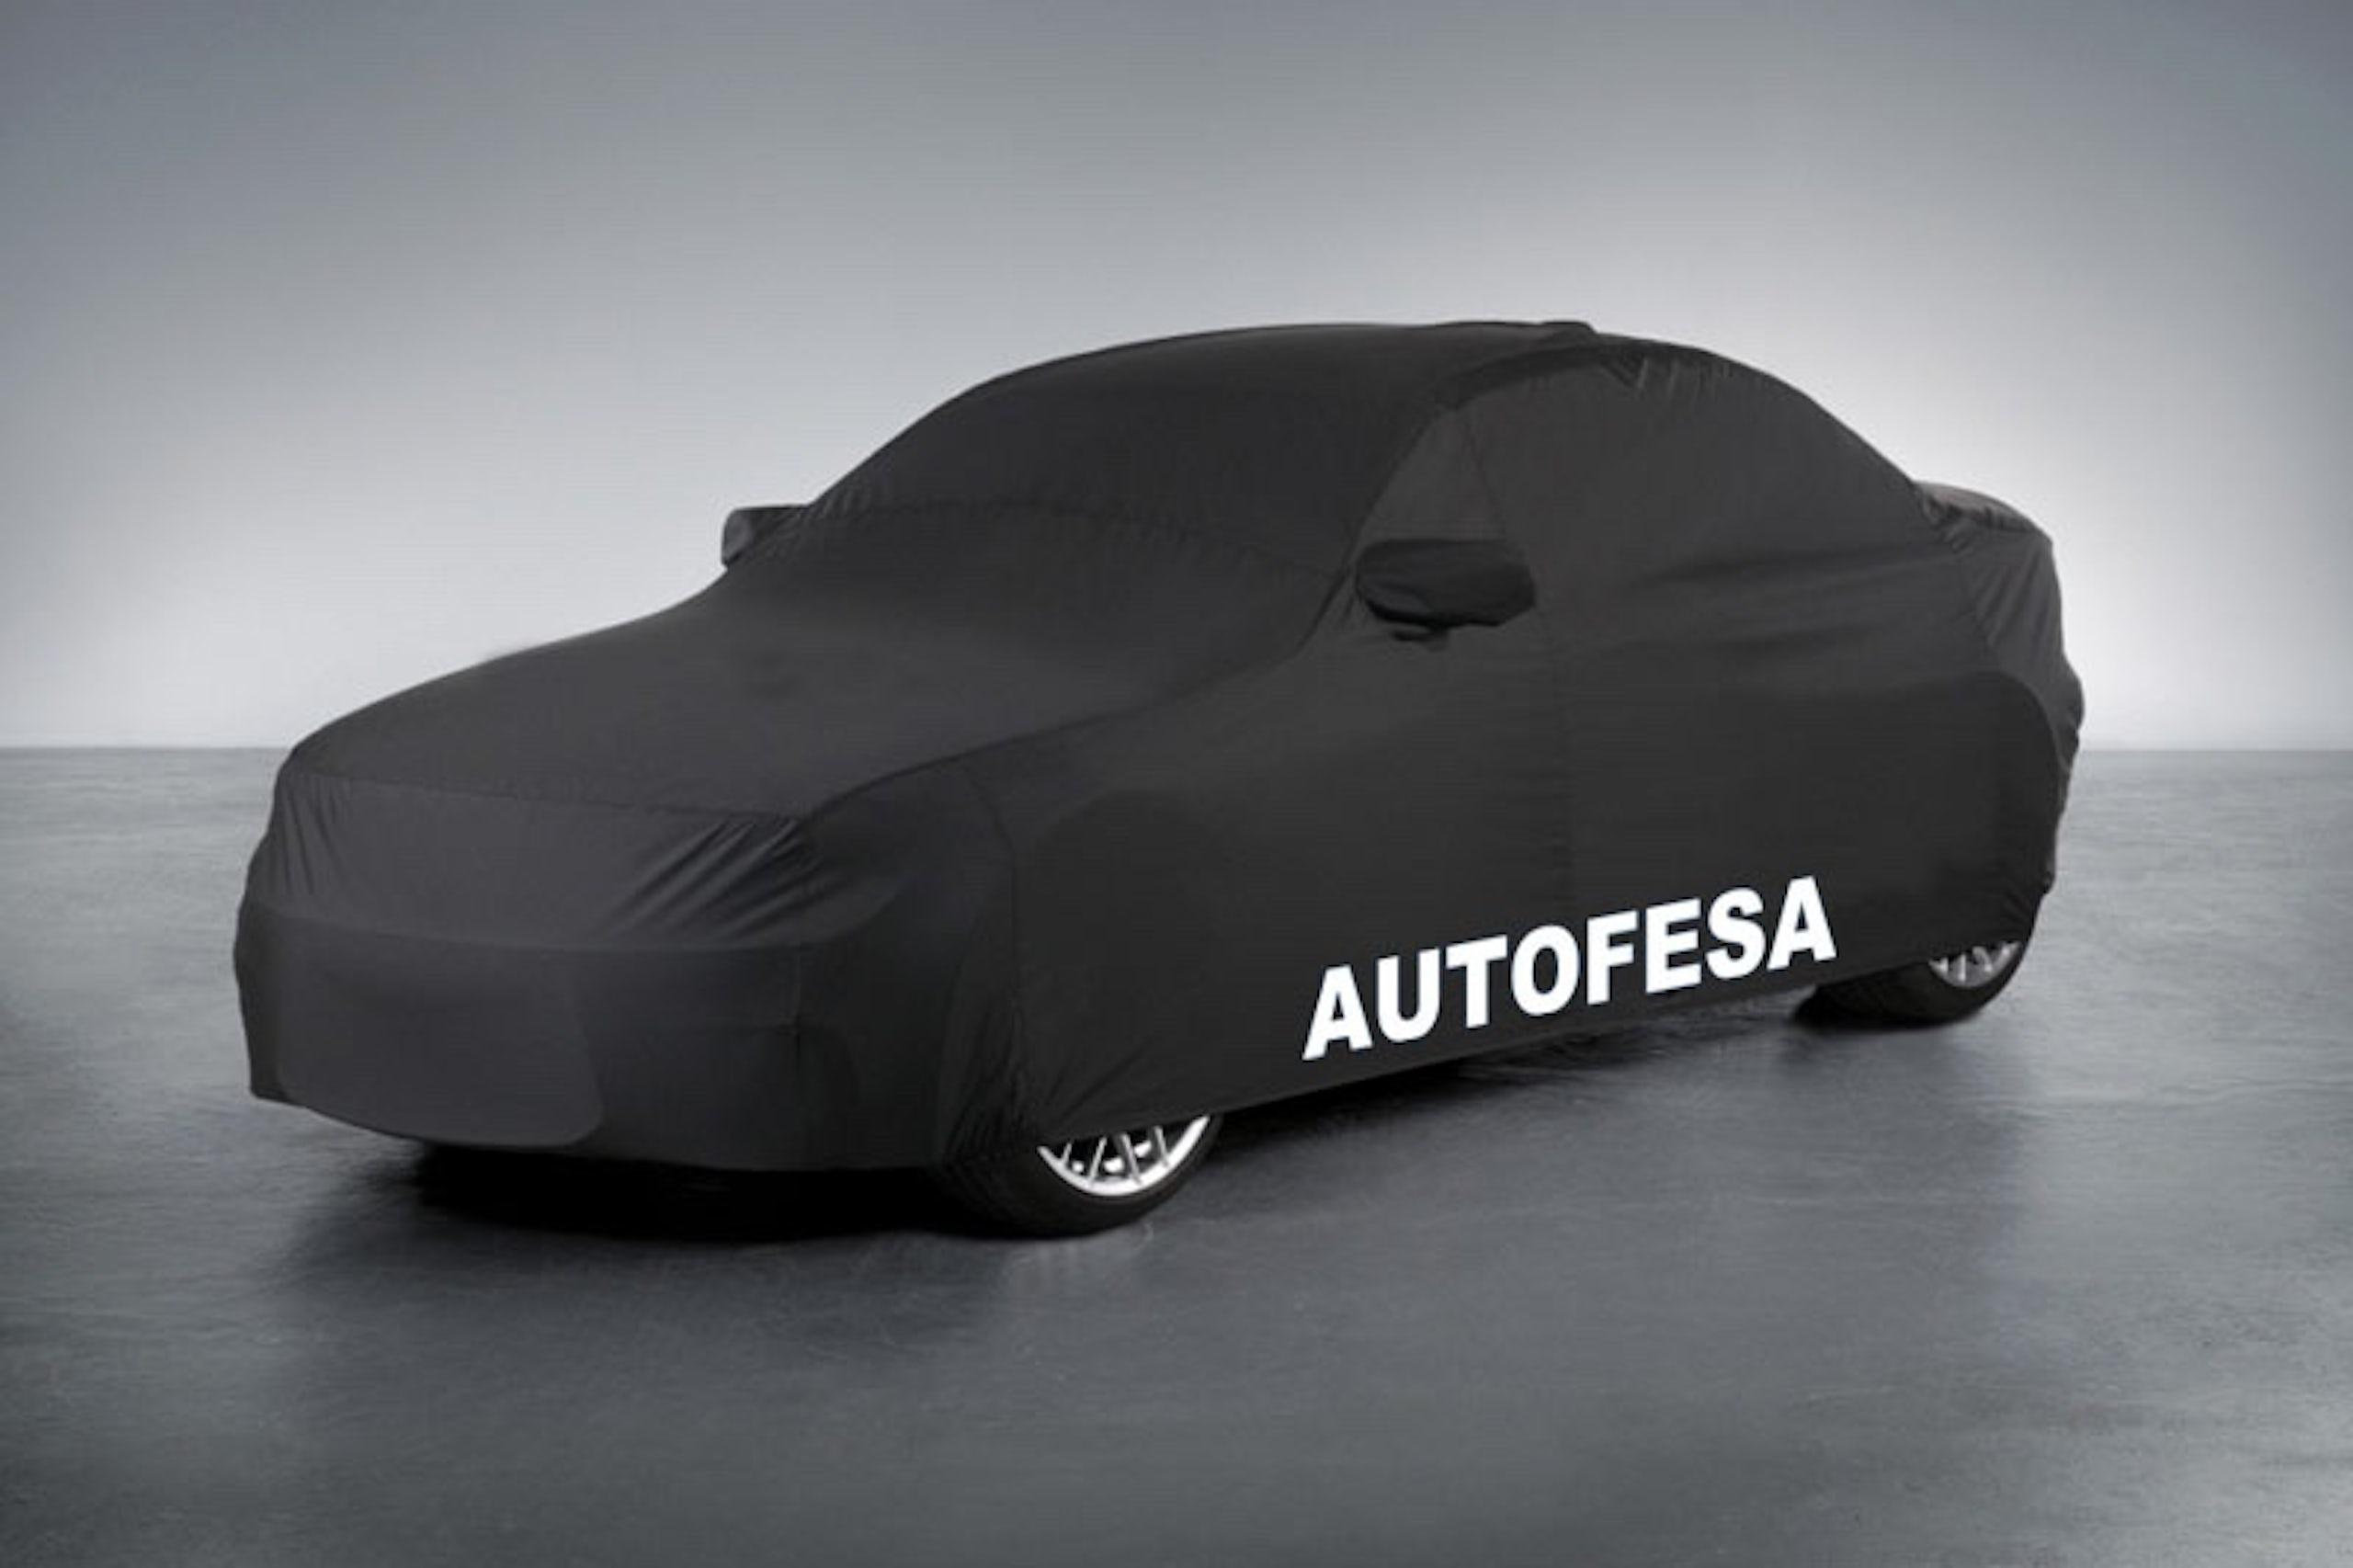 Audi A6 A6Avant COMPETITION ABT 3.0 TDI V6 T 326cv quattro 5p S tronic 4x4 Cpmpetition ABT S/S - Foto 24